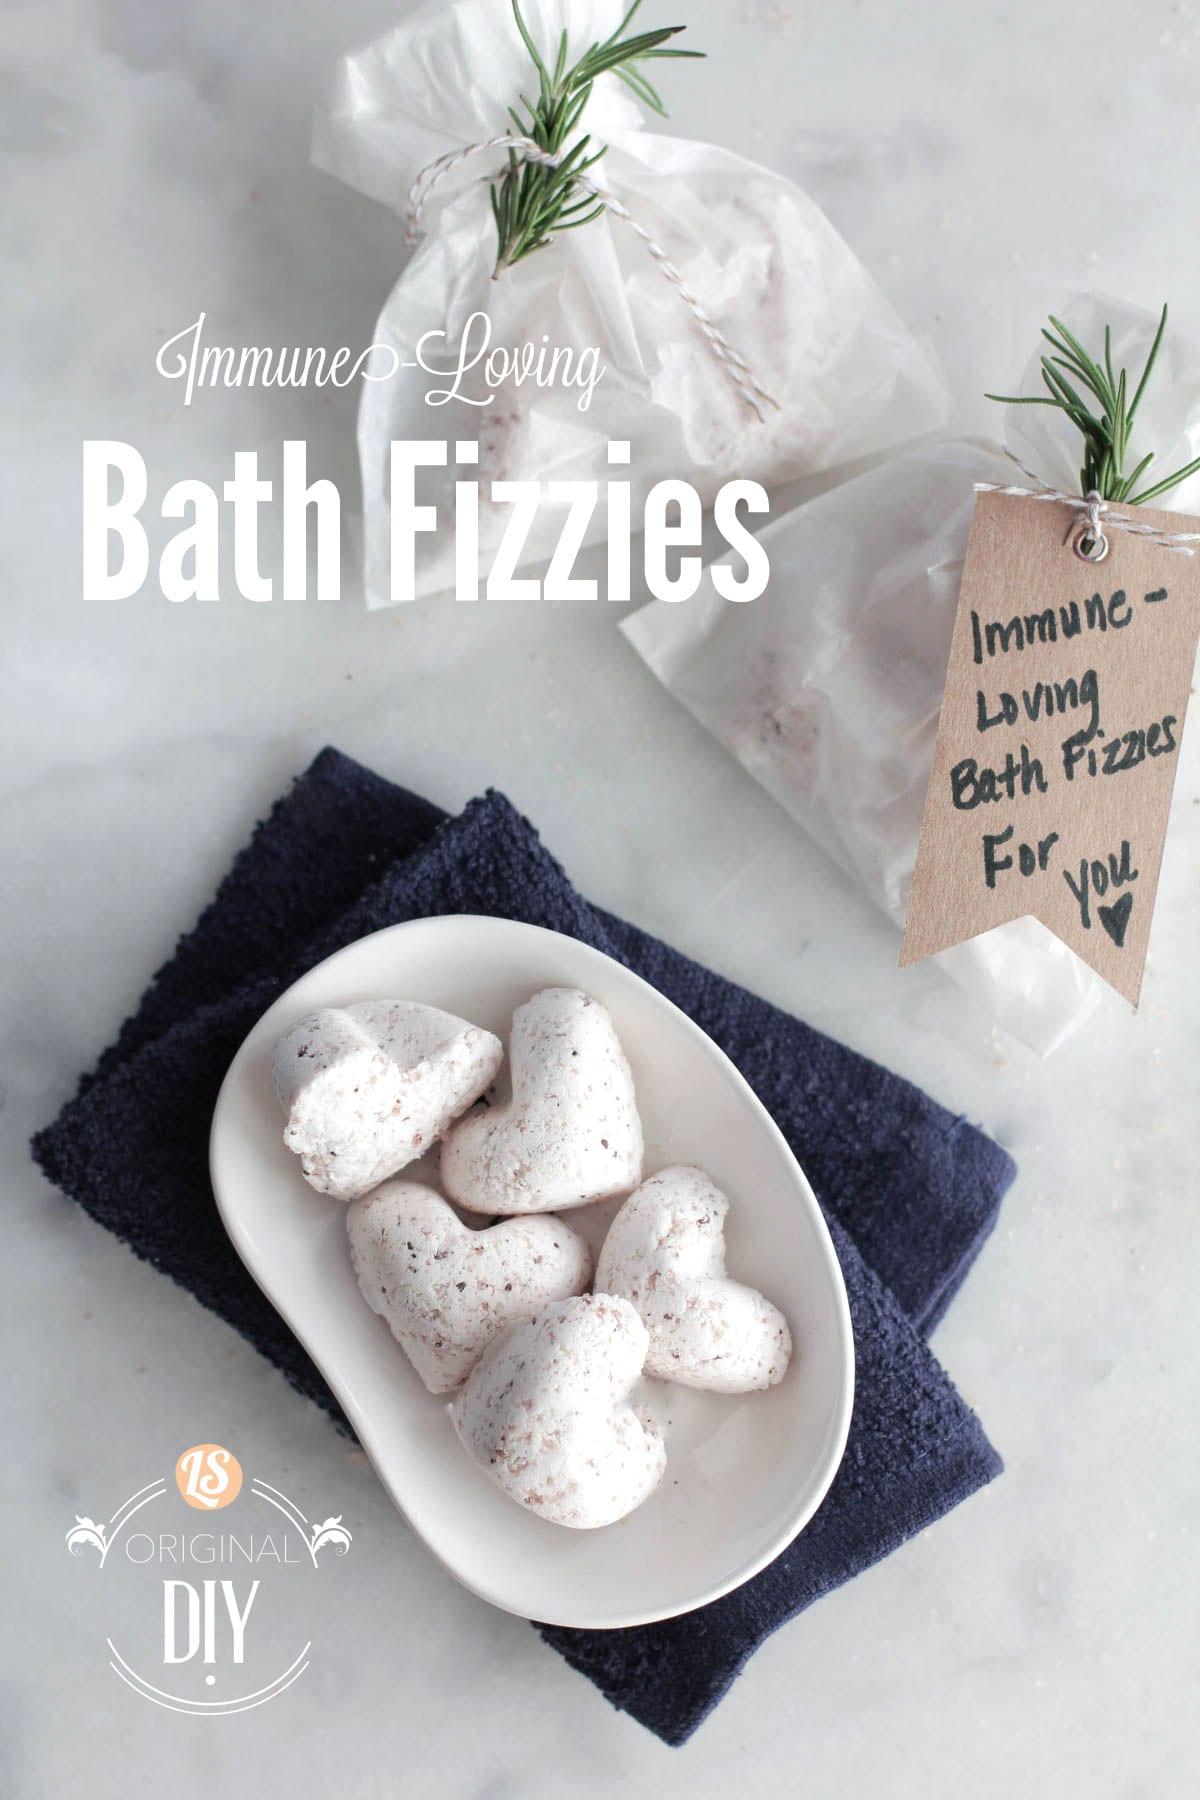 Diy Homemade Immune Loving Bath Fizzies Live Simply